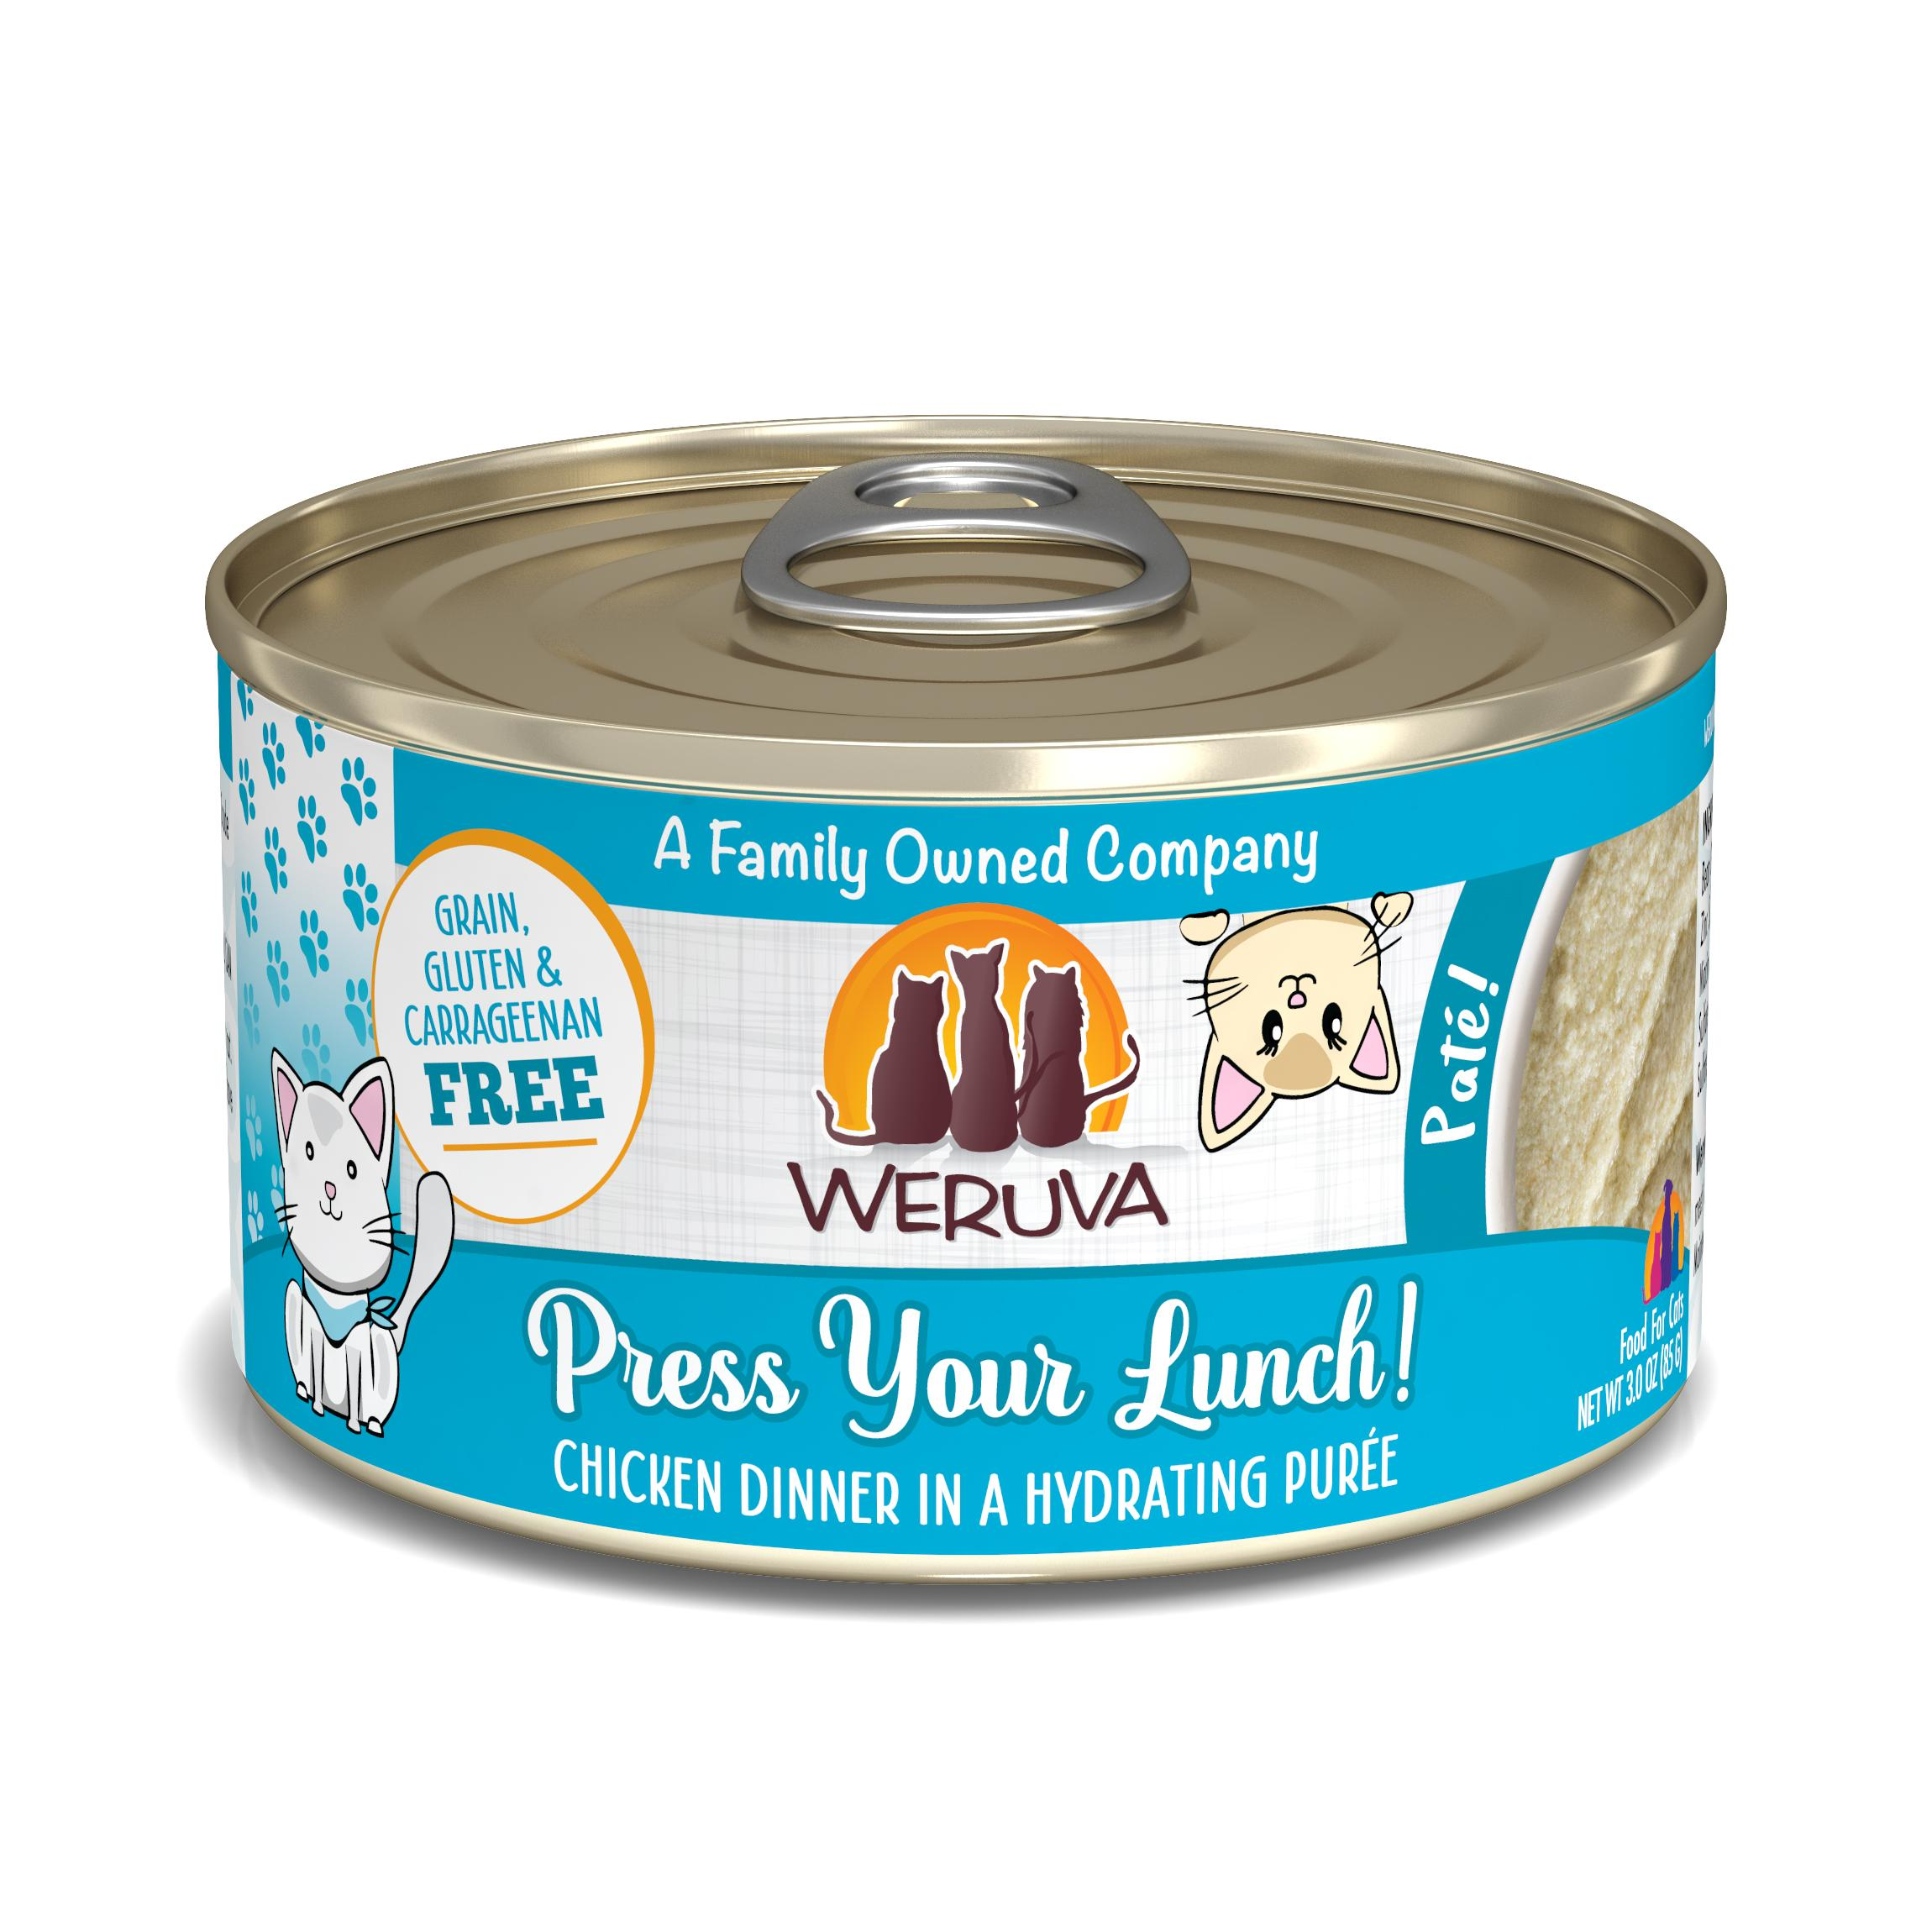 Weruva Cat Pate Press Your Lunch! Chicken Dinner in Puree Wet Cat Food Image